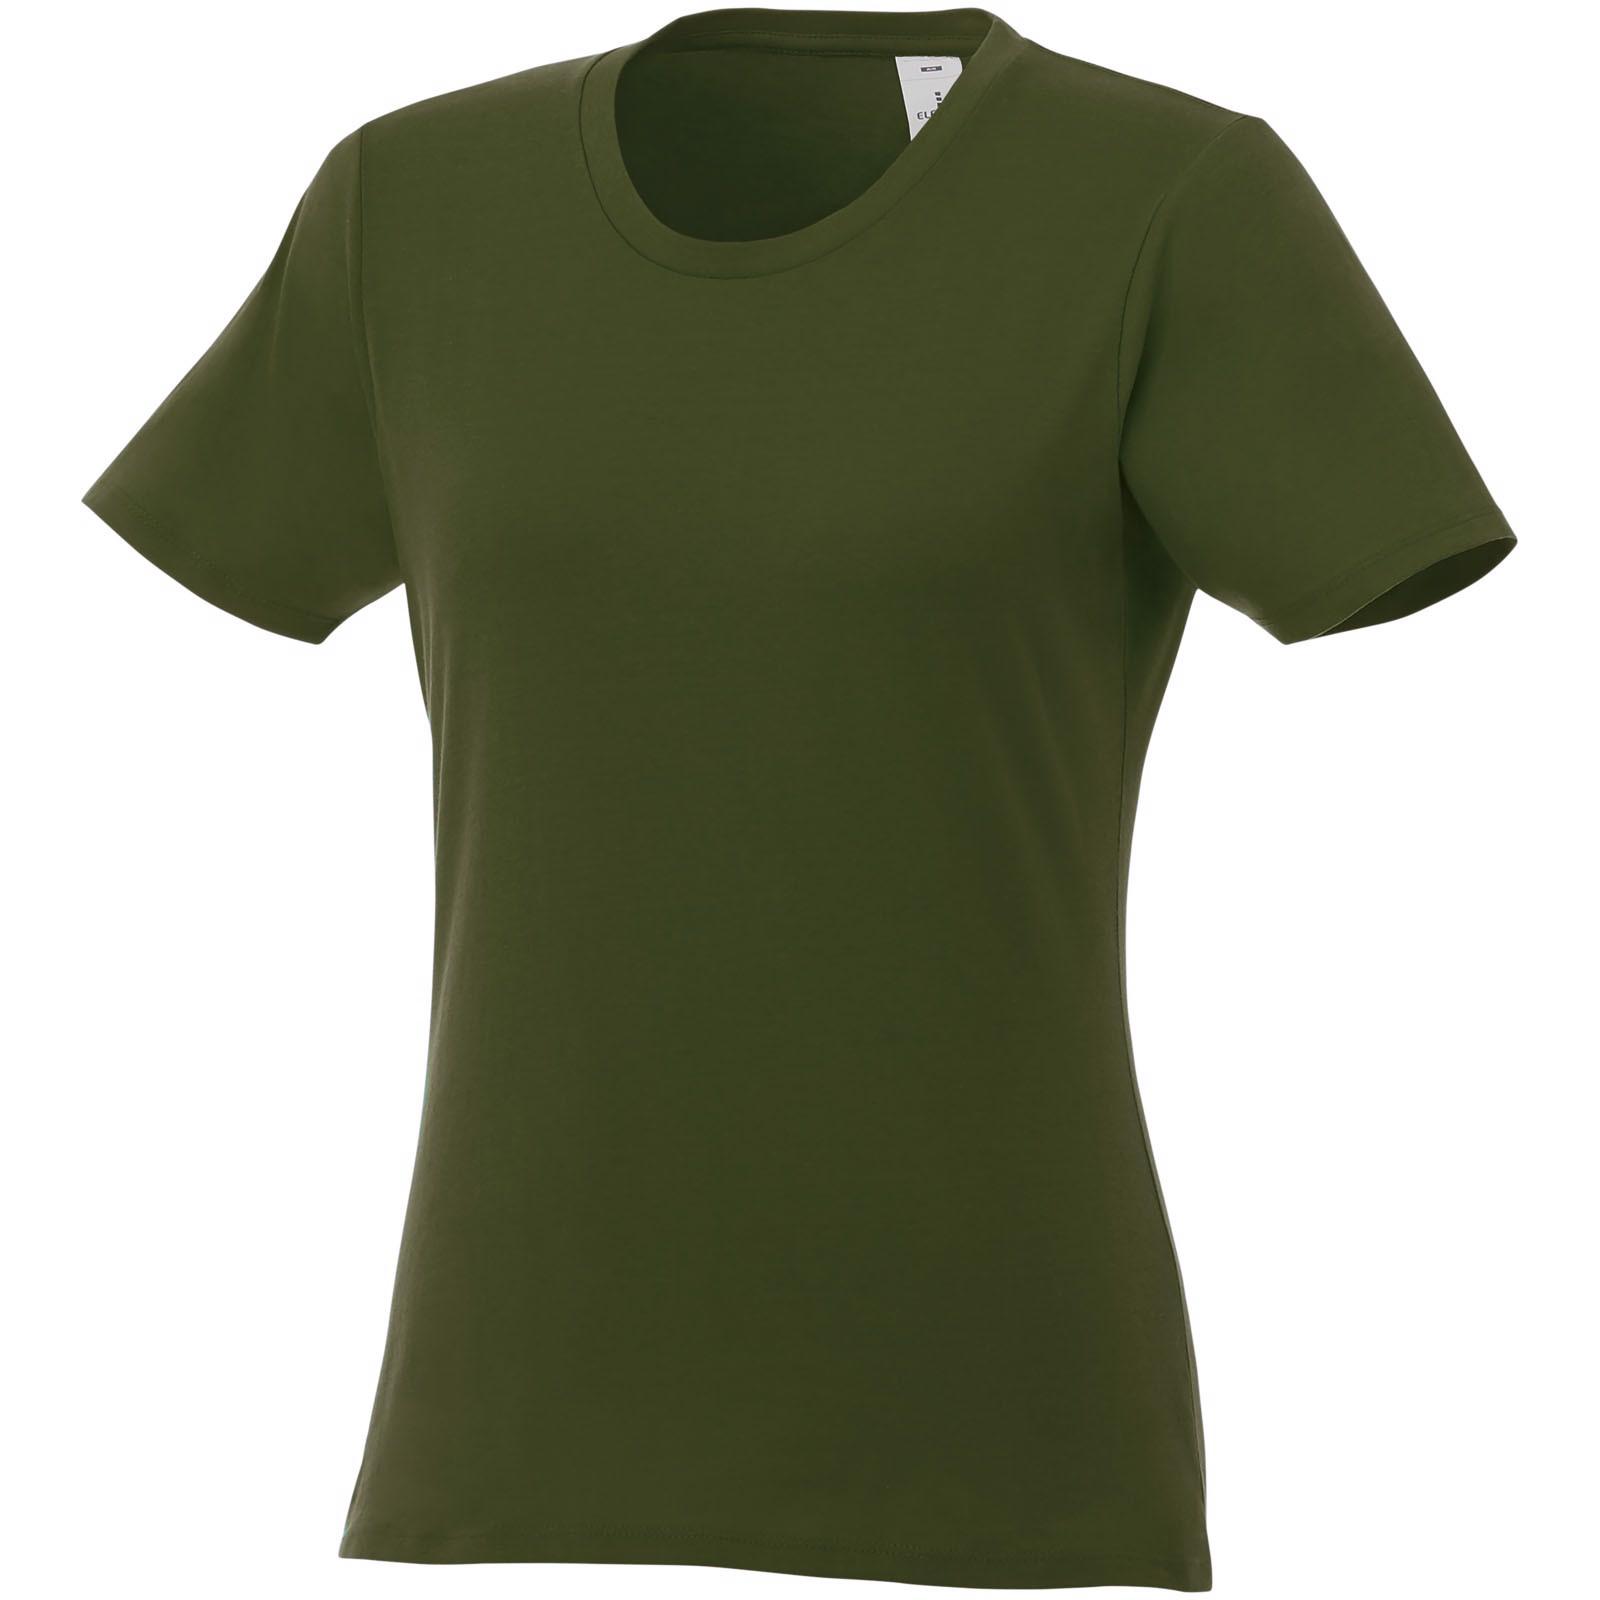 Heros short sleeve women's t-shirt - Army green / XXL